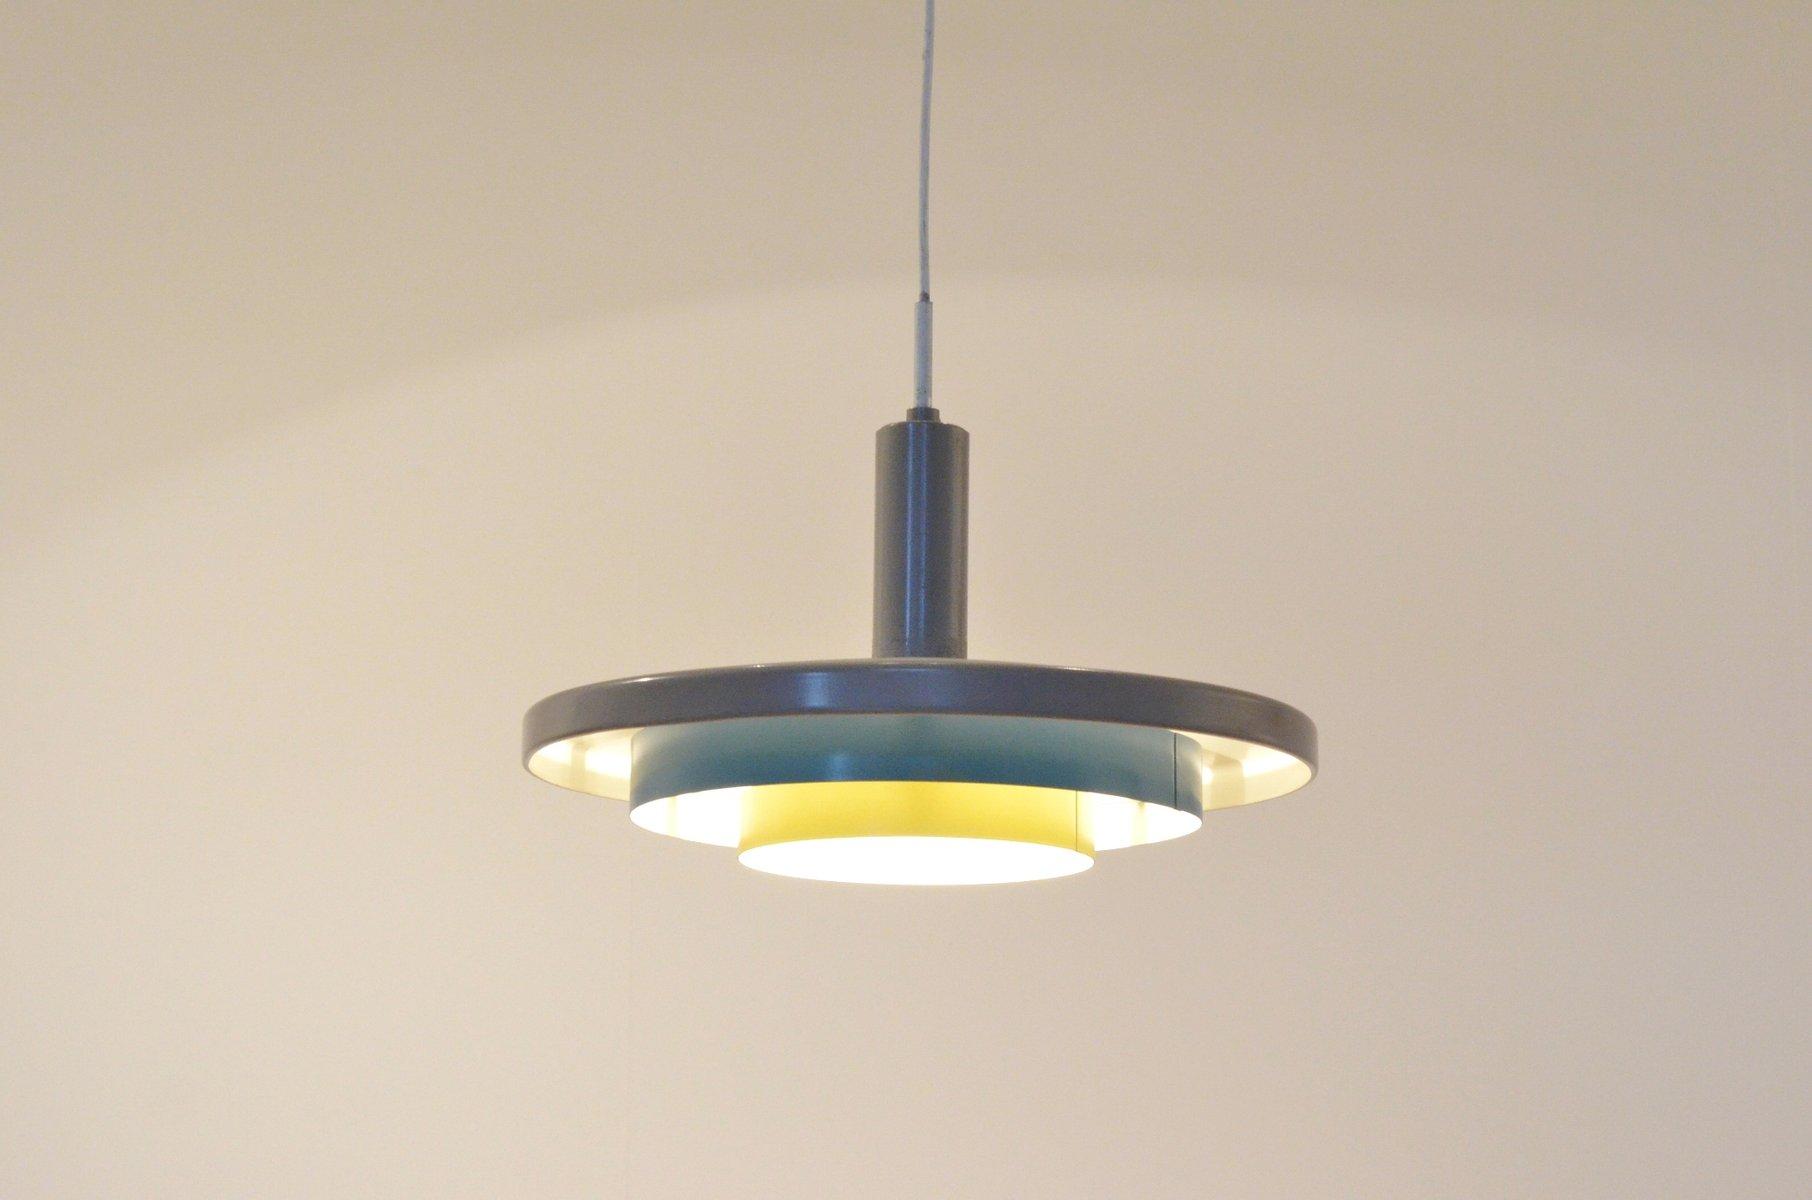 mid century modern nt23c 00 metal pendant light from. Black Bedroom Furniture Sets. Home Design Ideas